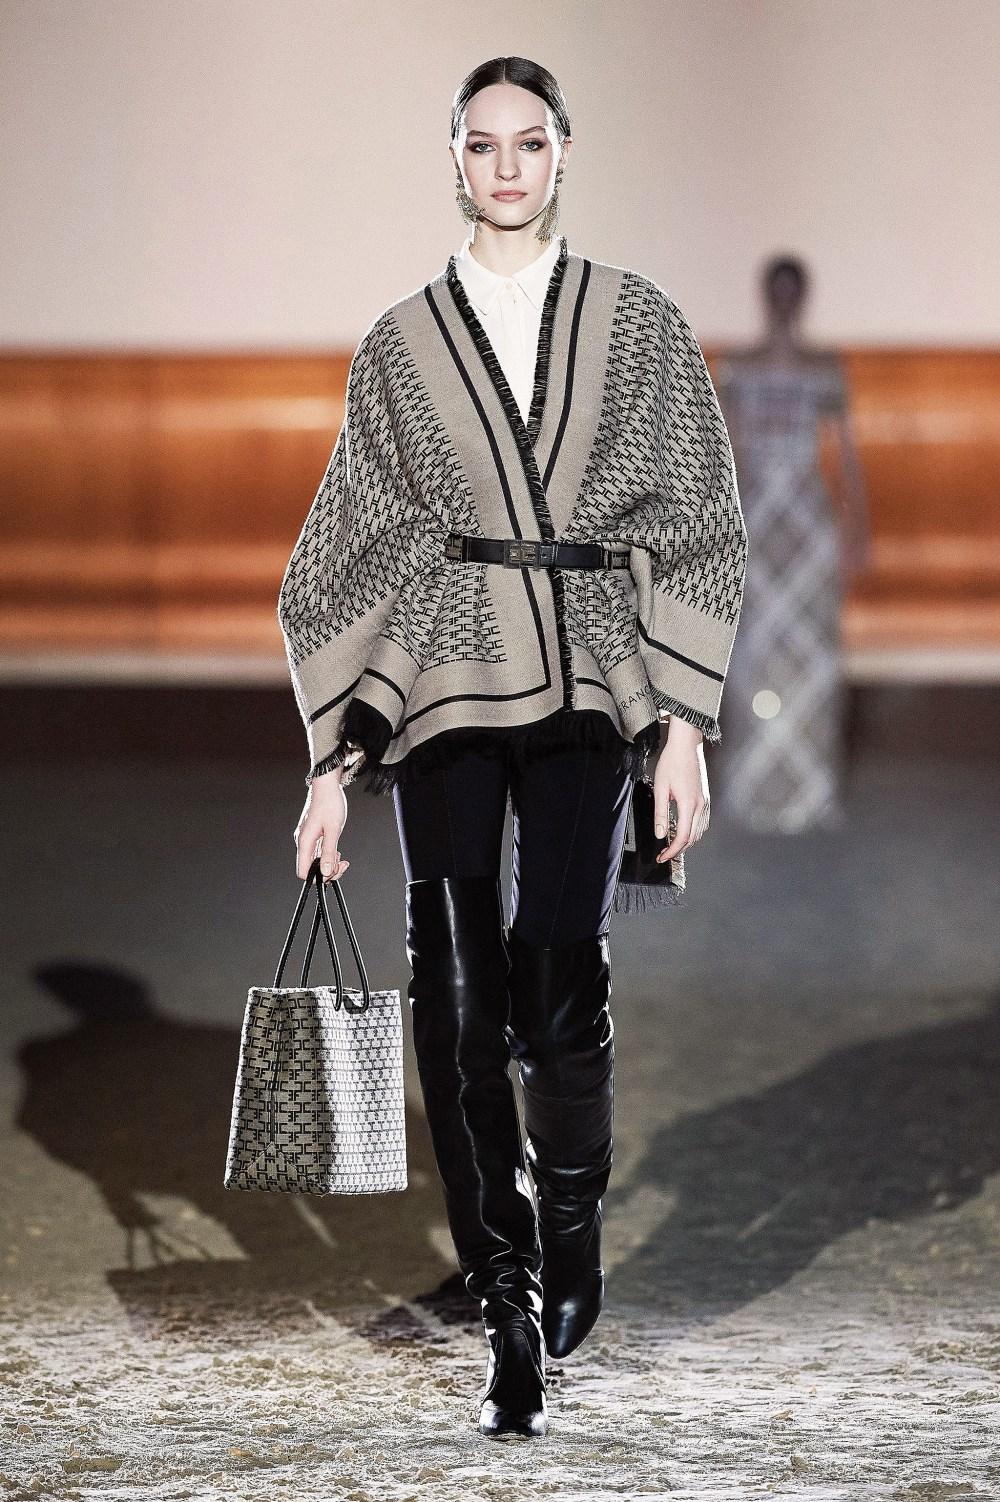 Elisabetta Franchi: Elisabetta Franchi Fall Winter 2021-22 Fashion Show Photo #49